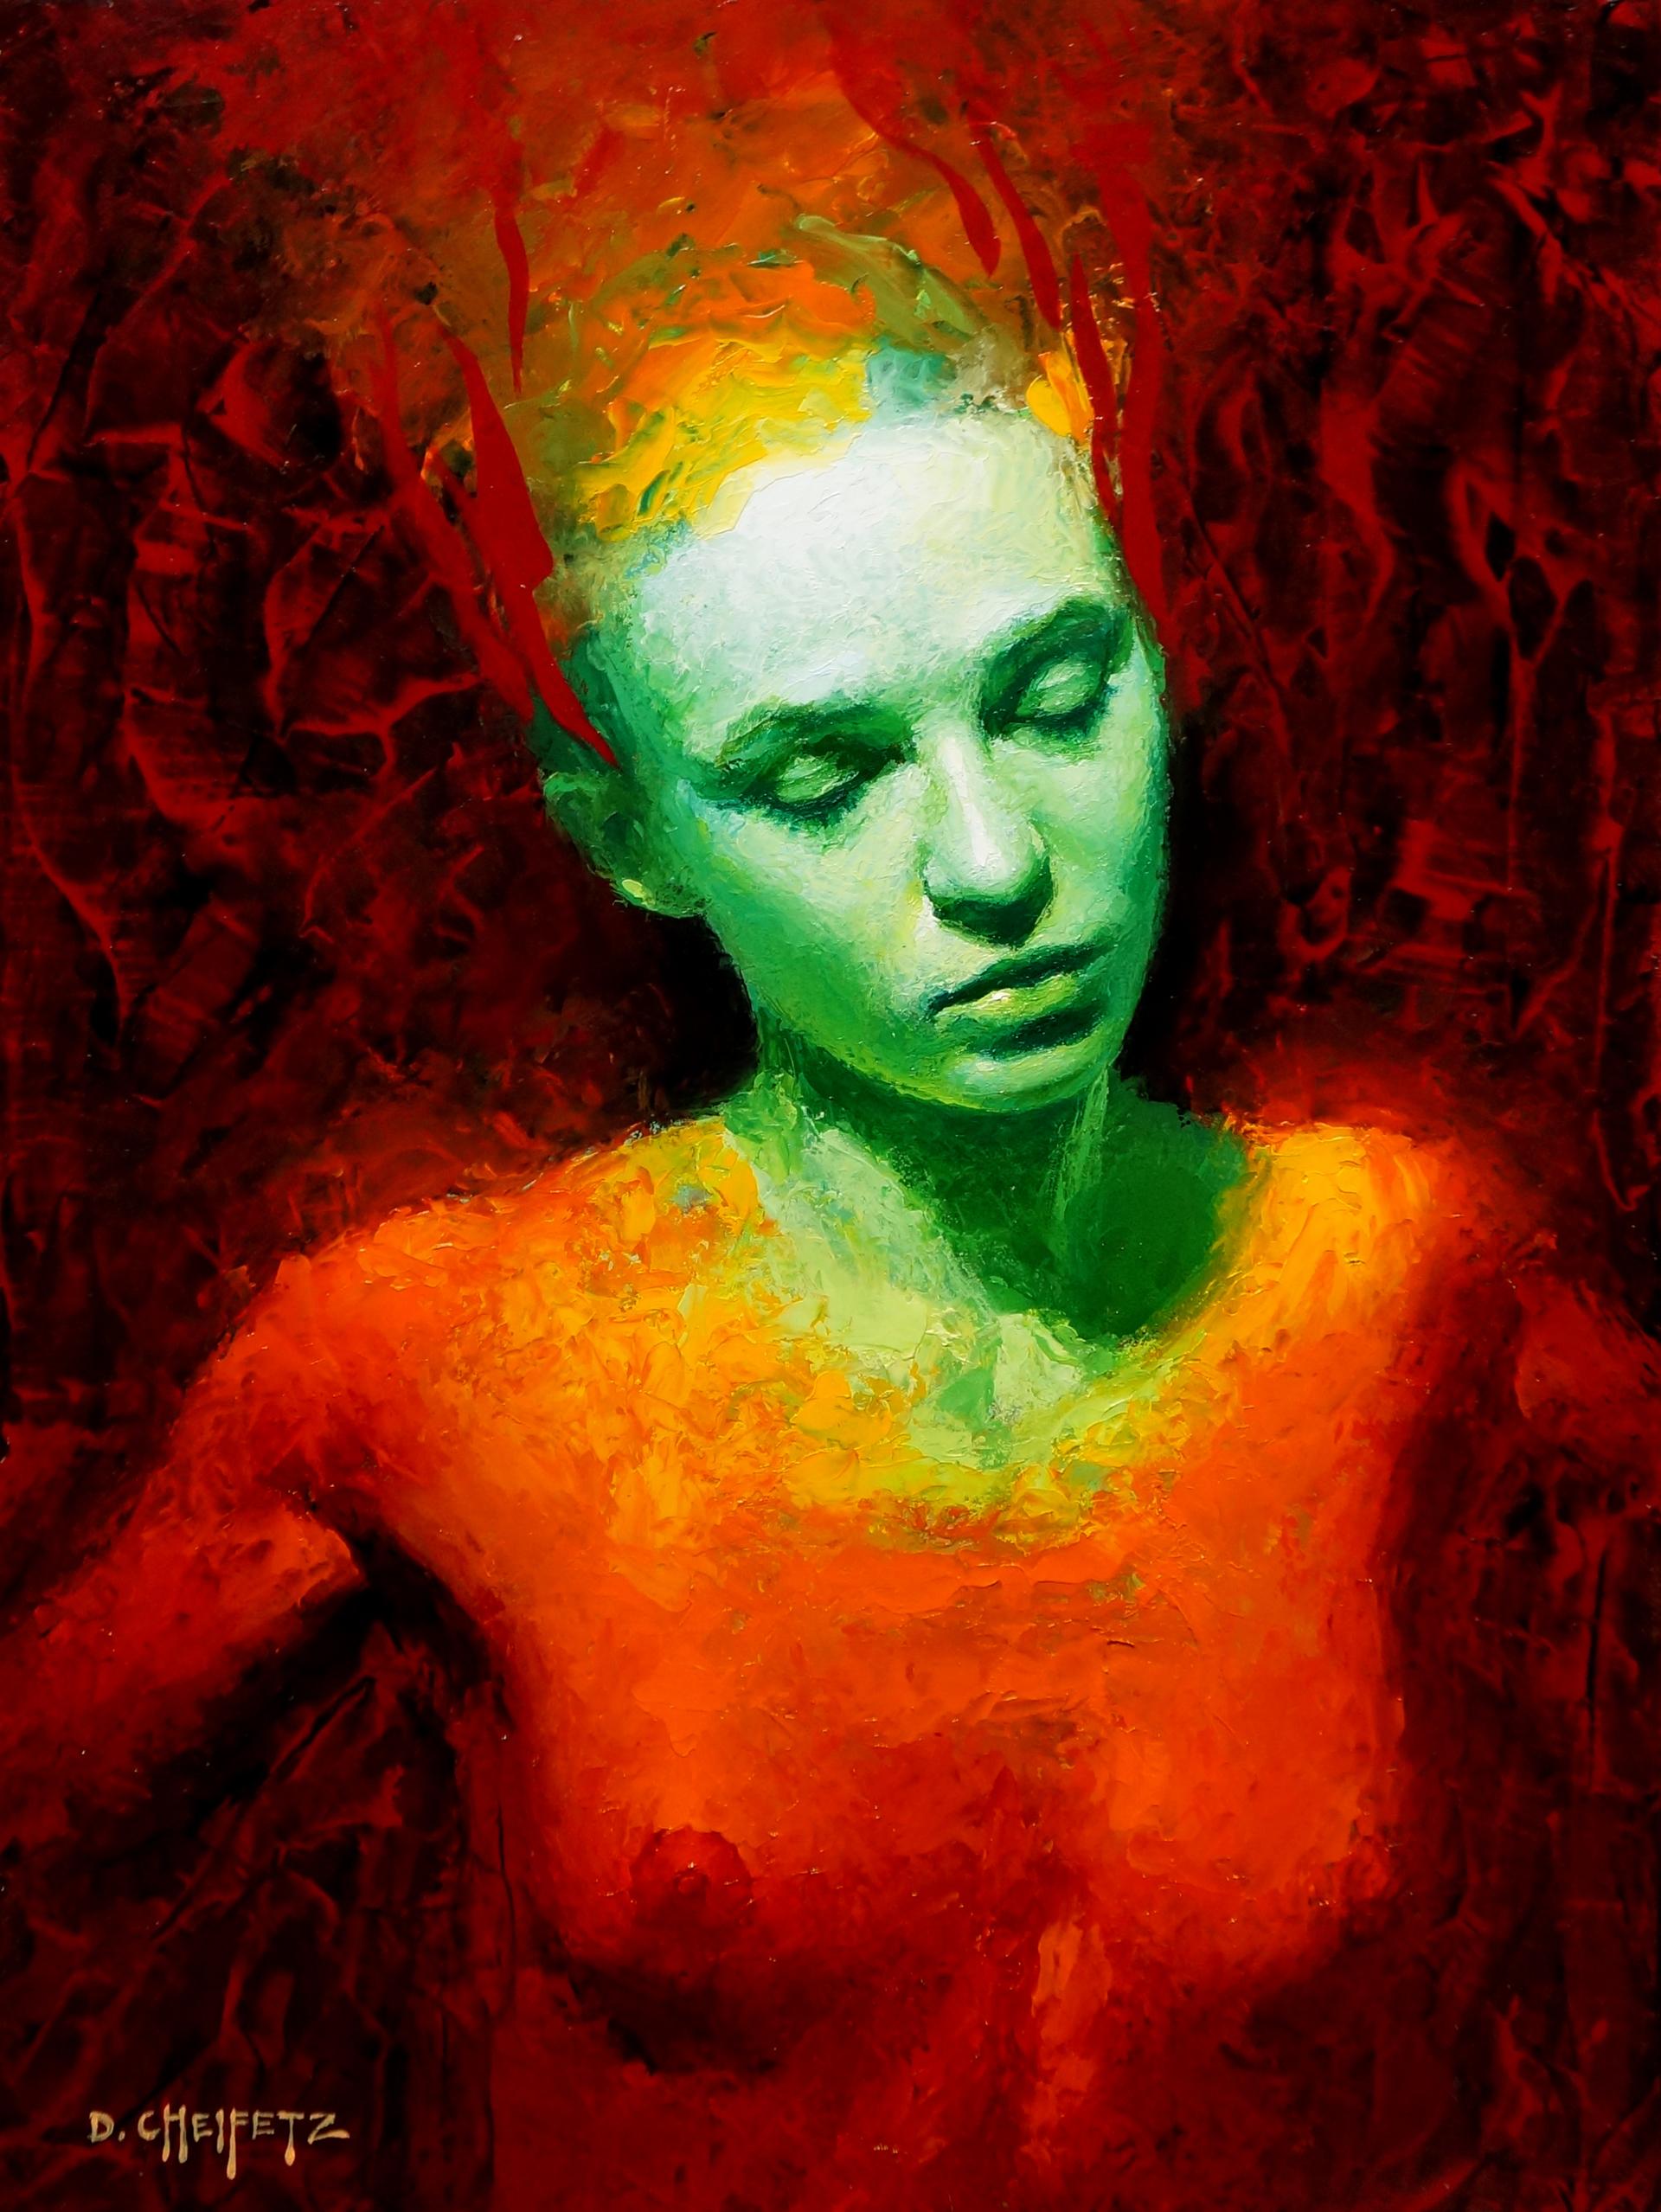 The Deep by David Cheifetz